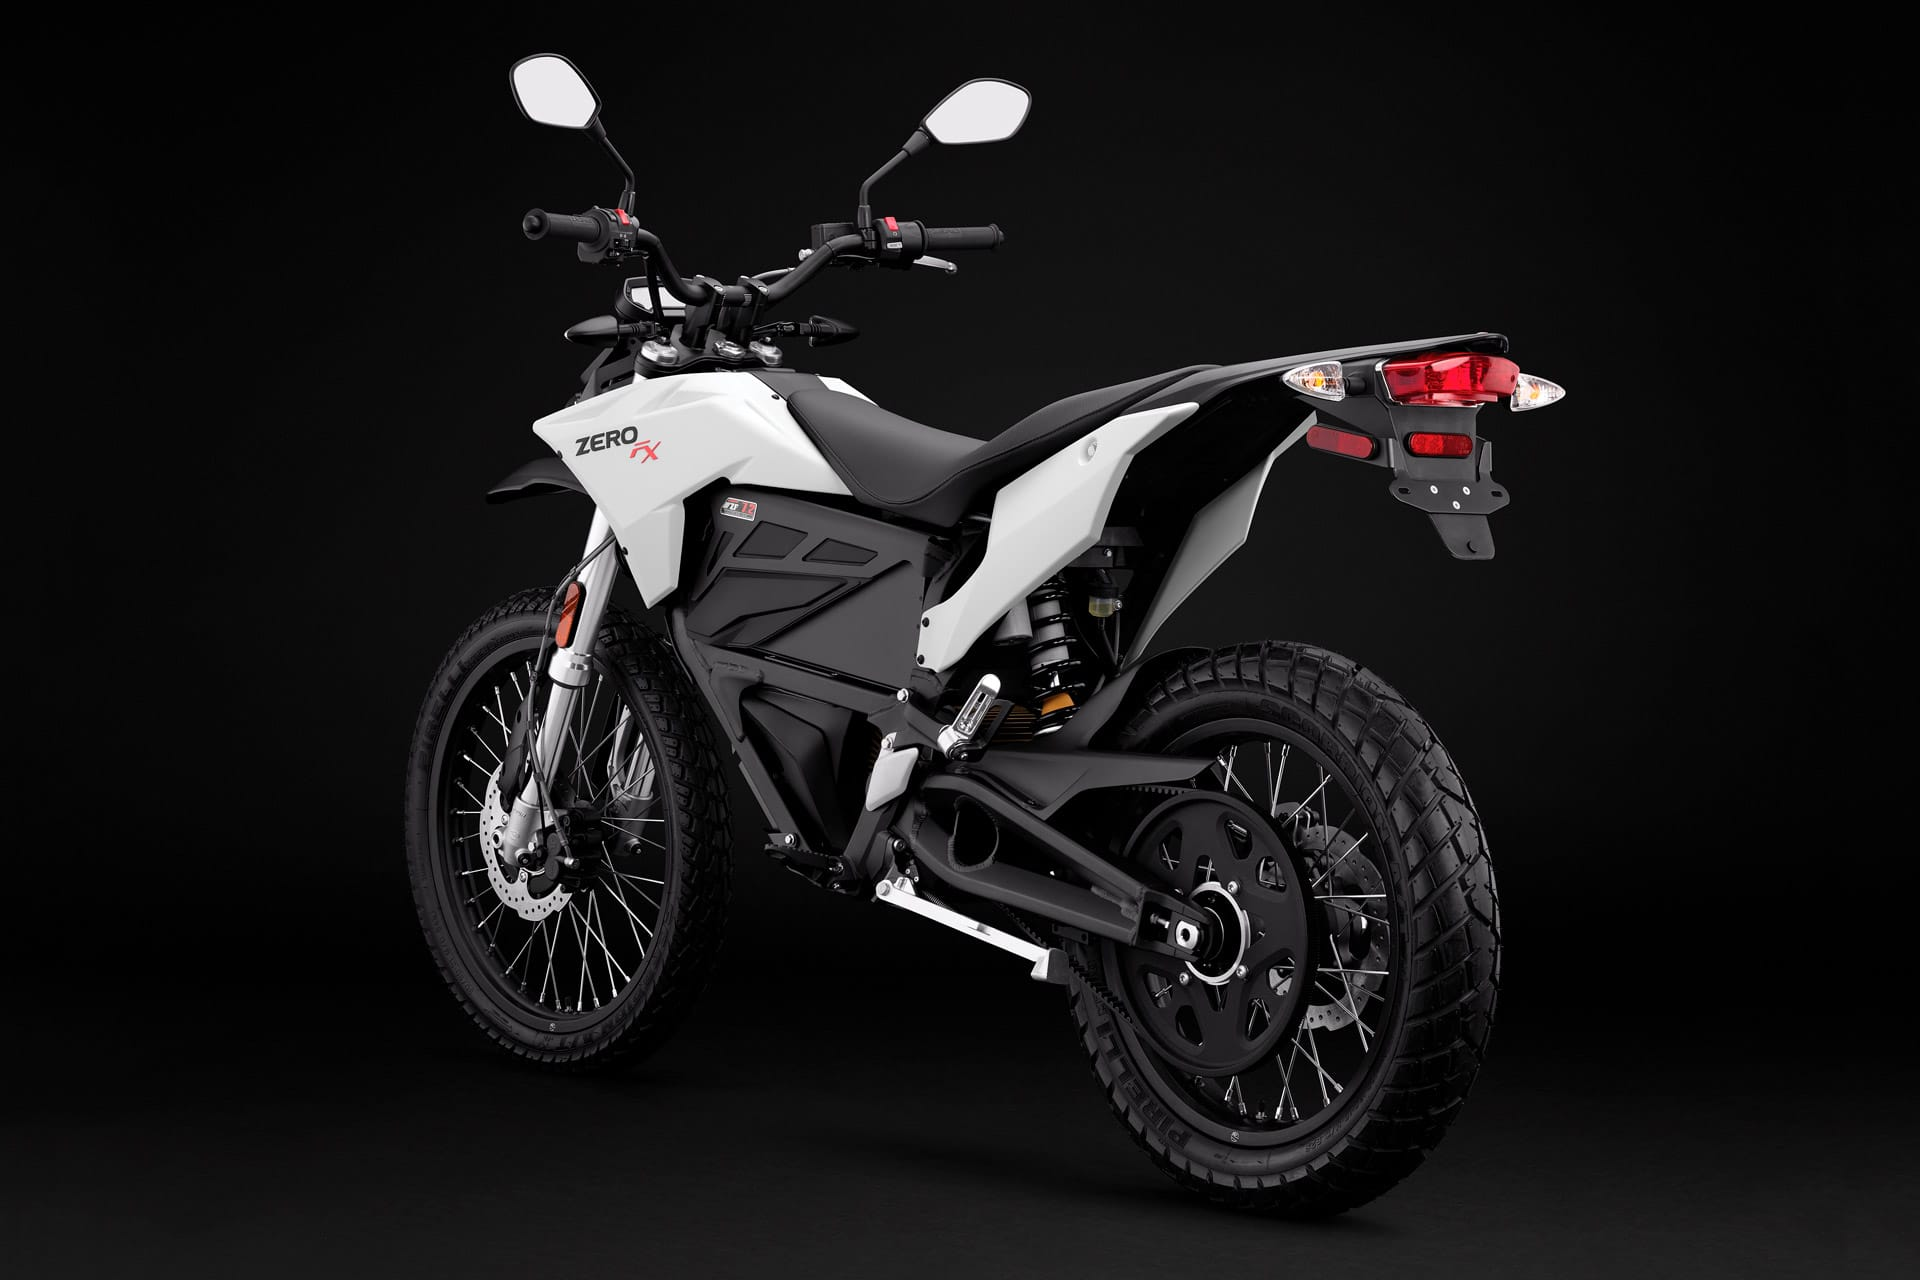 zero fx electric motorbike chelsea motorcycles group. Black Bedroom Furniture Sets. Home Design Ideas